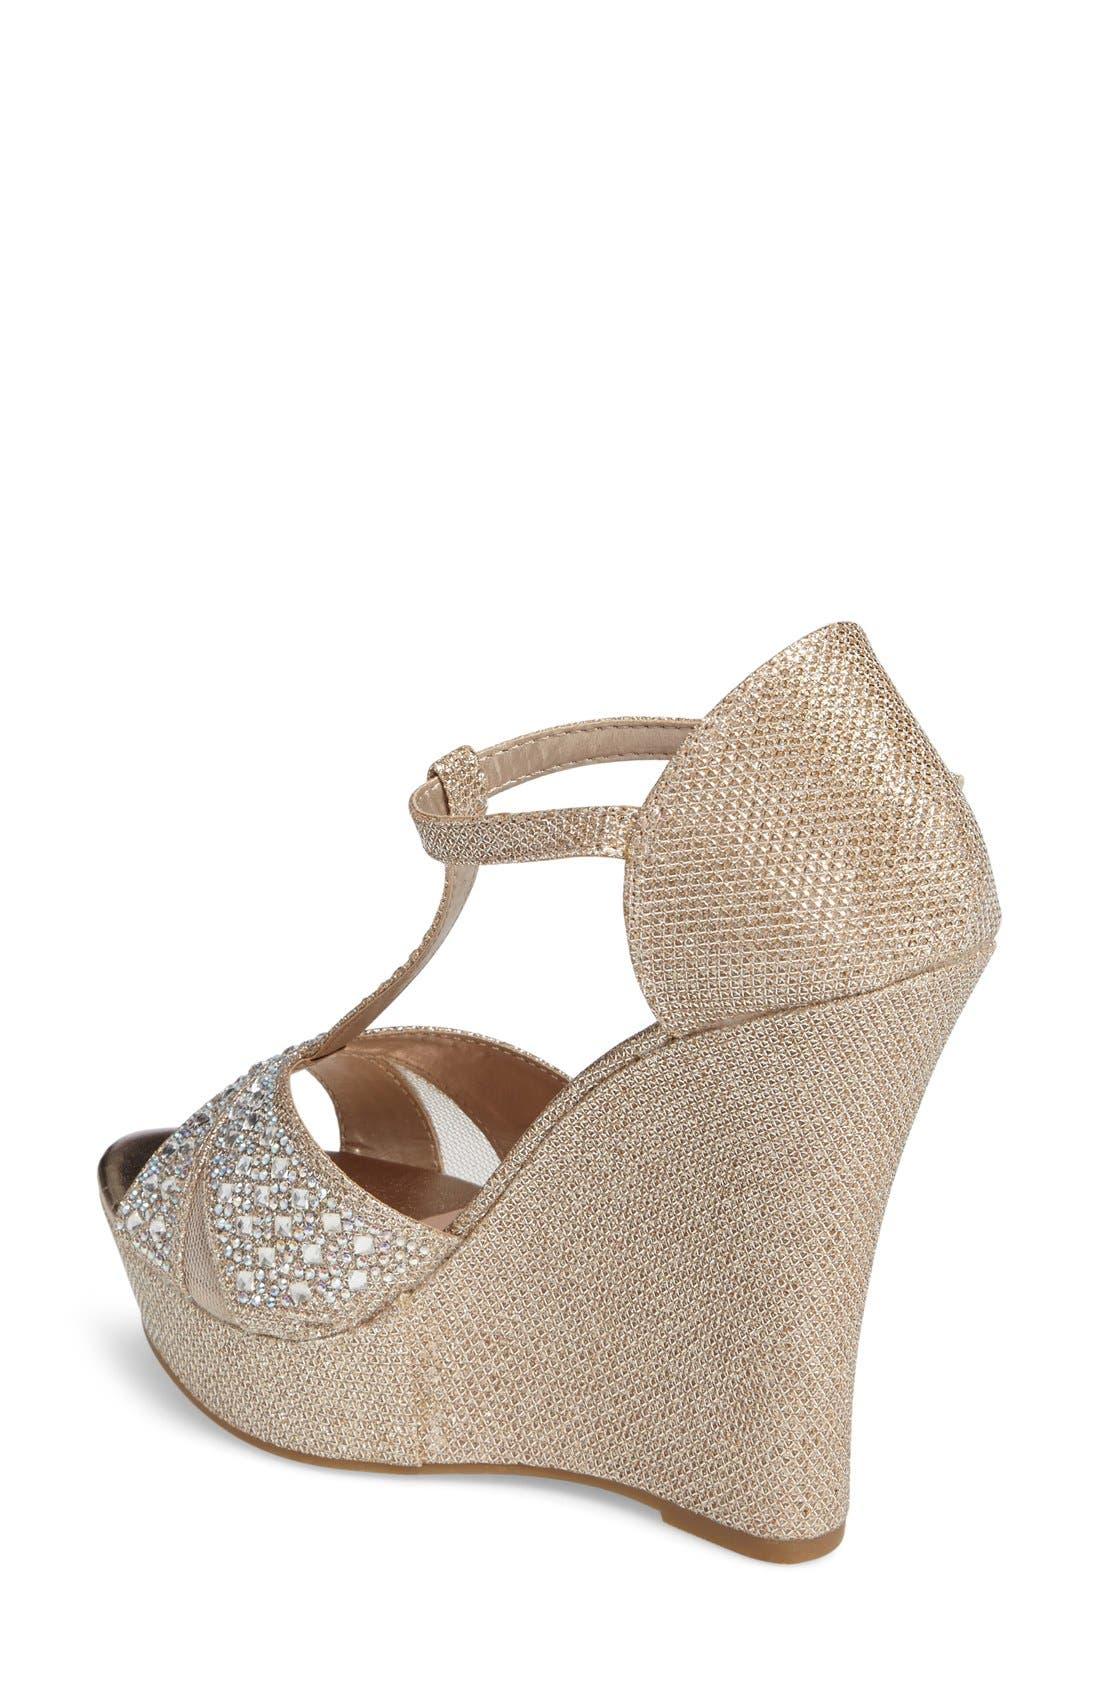 Ness Crystal Embellished Wedge Sandal,                             Alternate thumbnail 9, color,